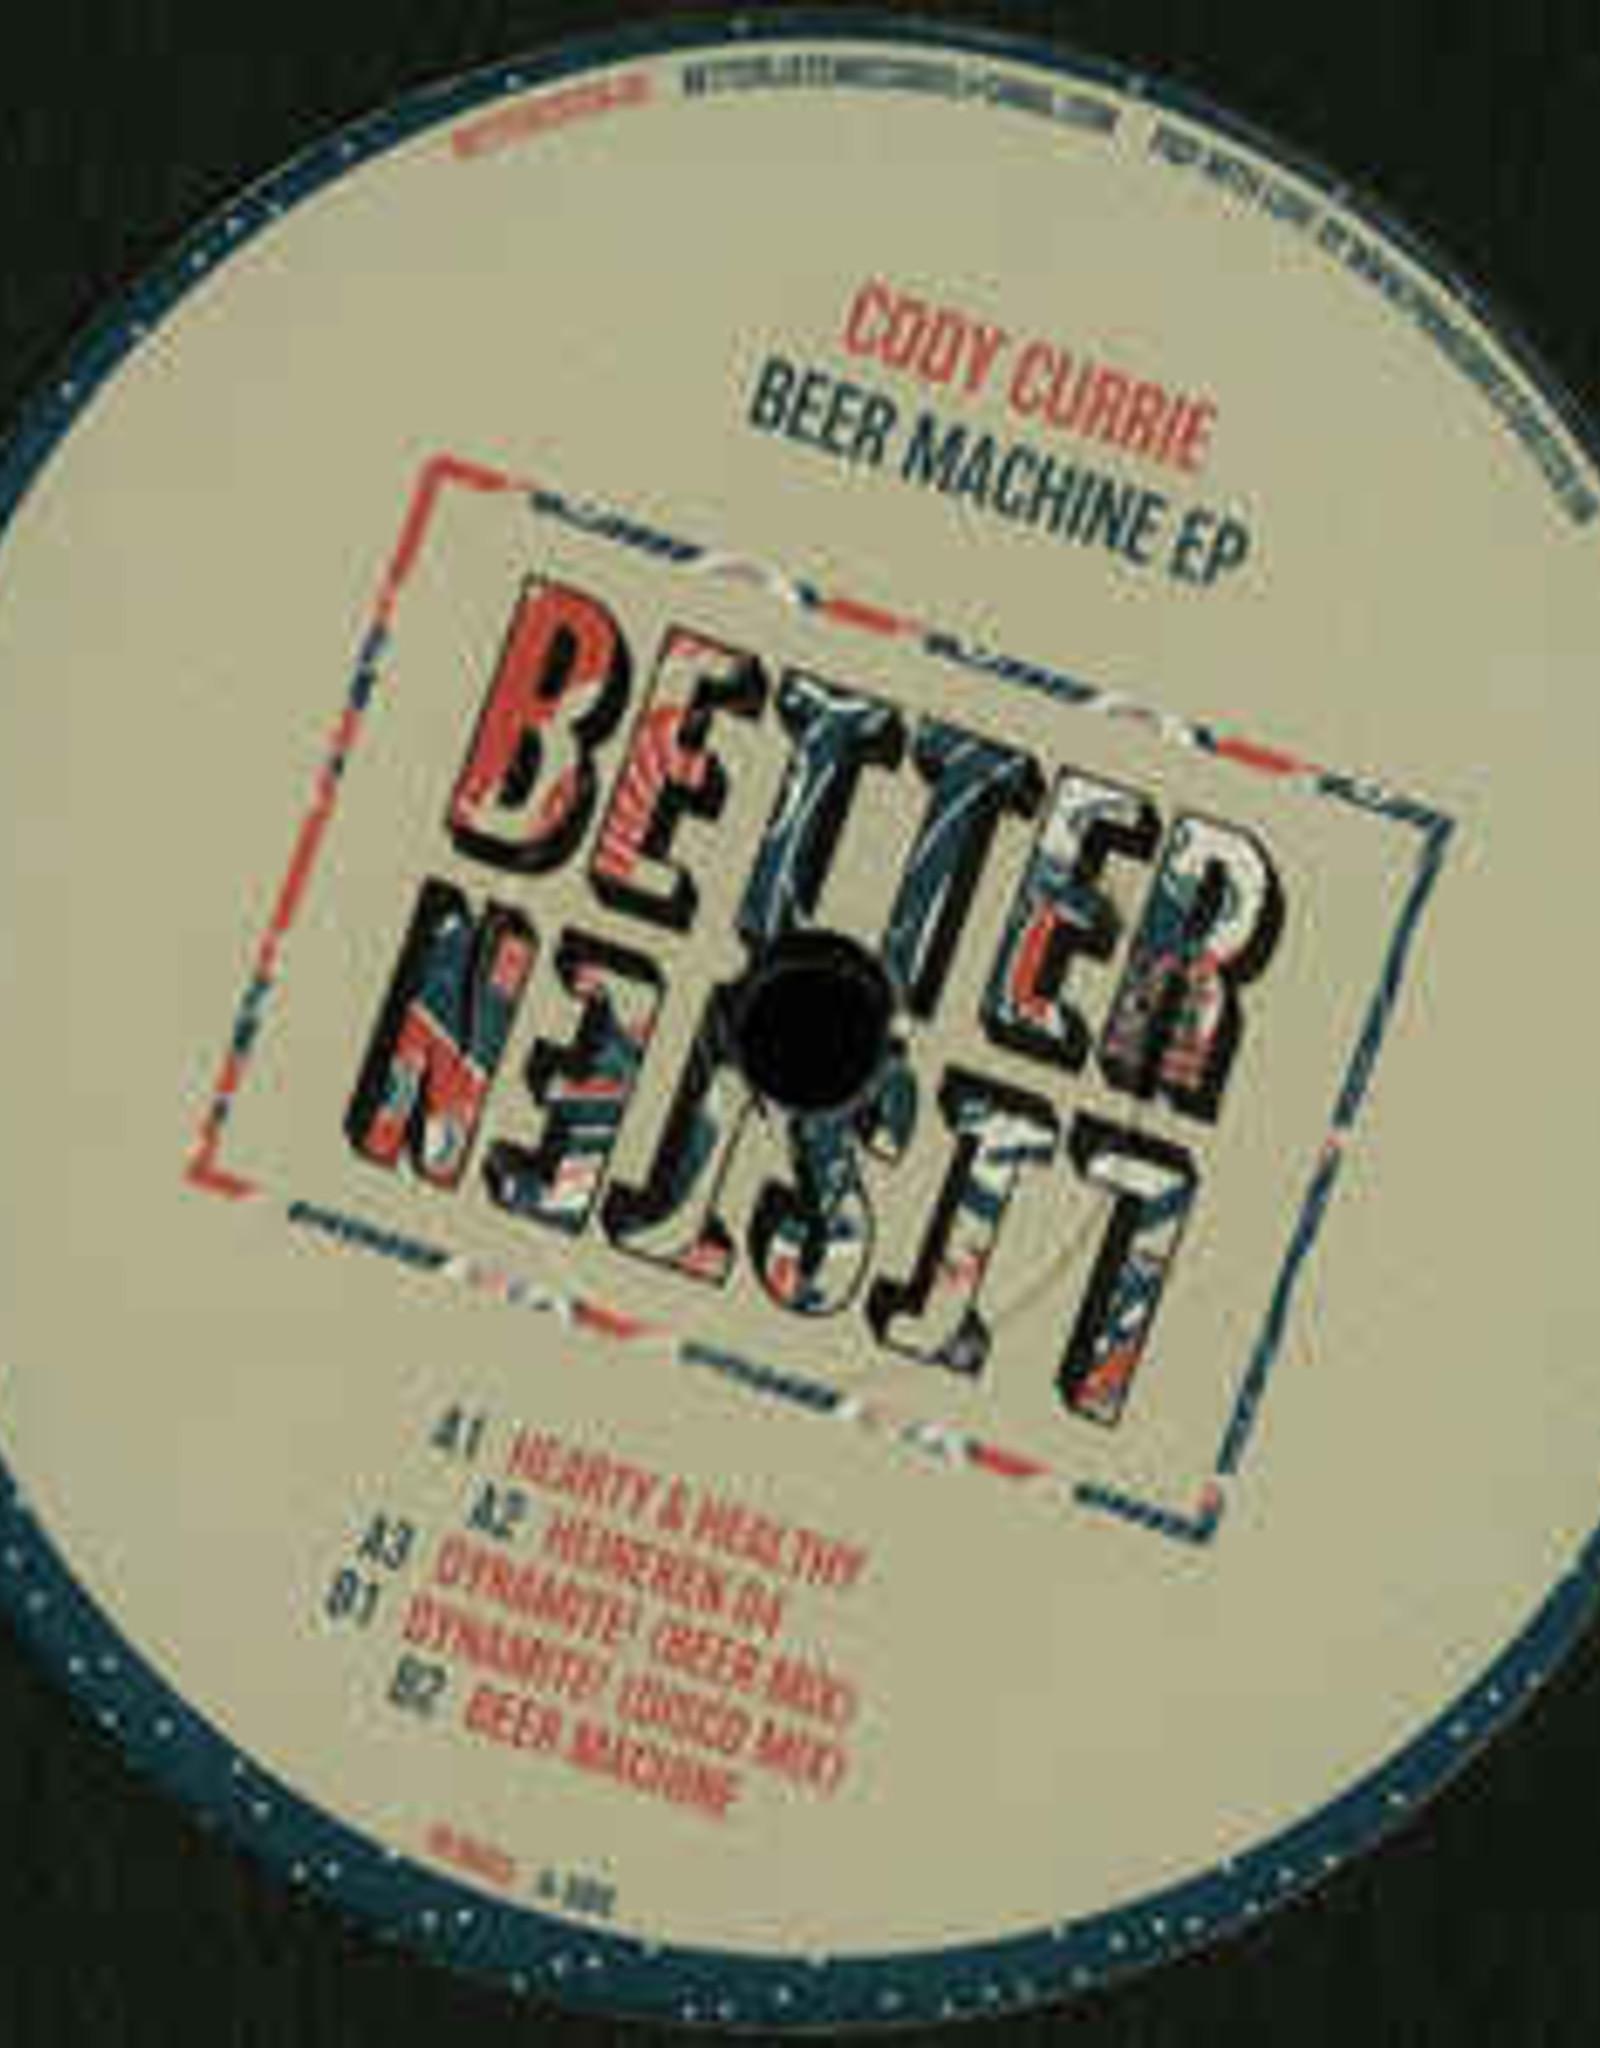 "Better Listen 3 - Cody Currie - Beer Machine Ep (12"", Ep)"